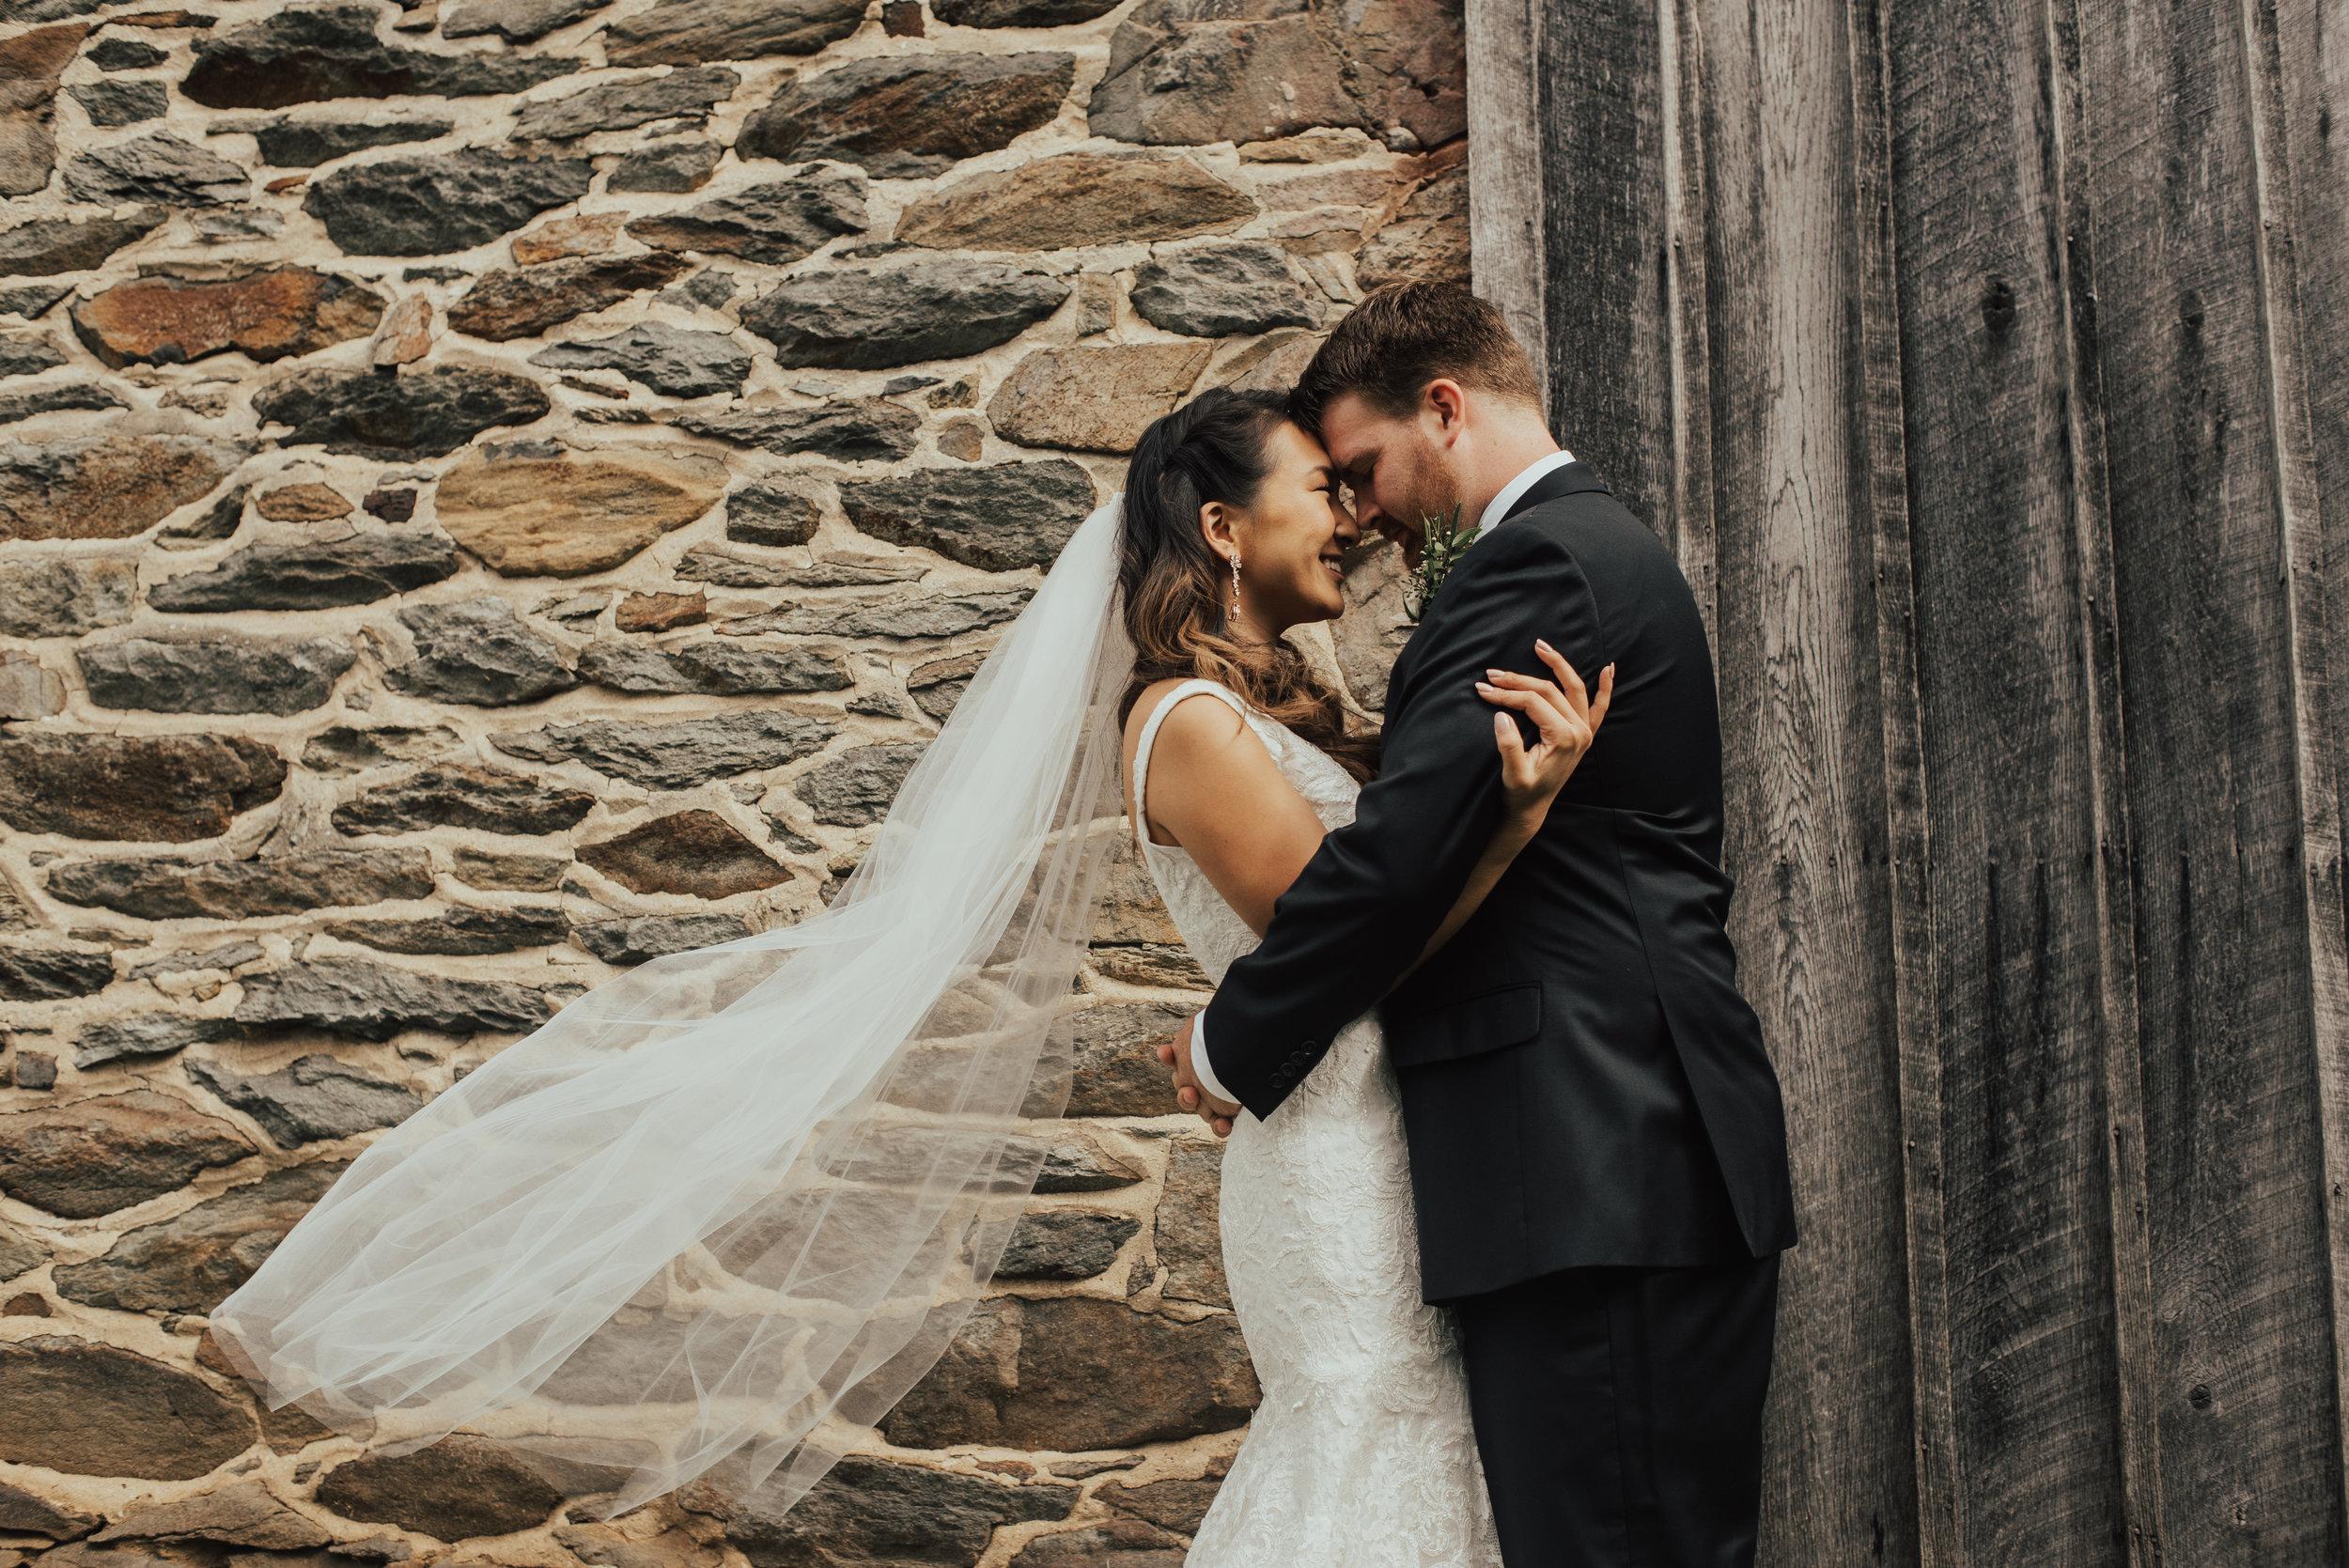 Sylvanside Farm Winter Wedding By SB Photographs313131031003131310313131313131295295295031000313131031.jpg